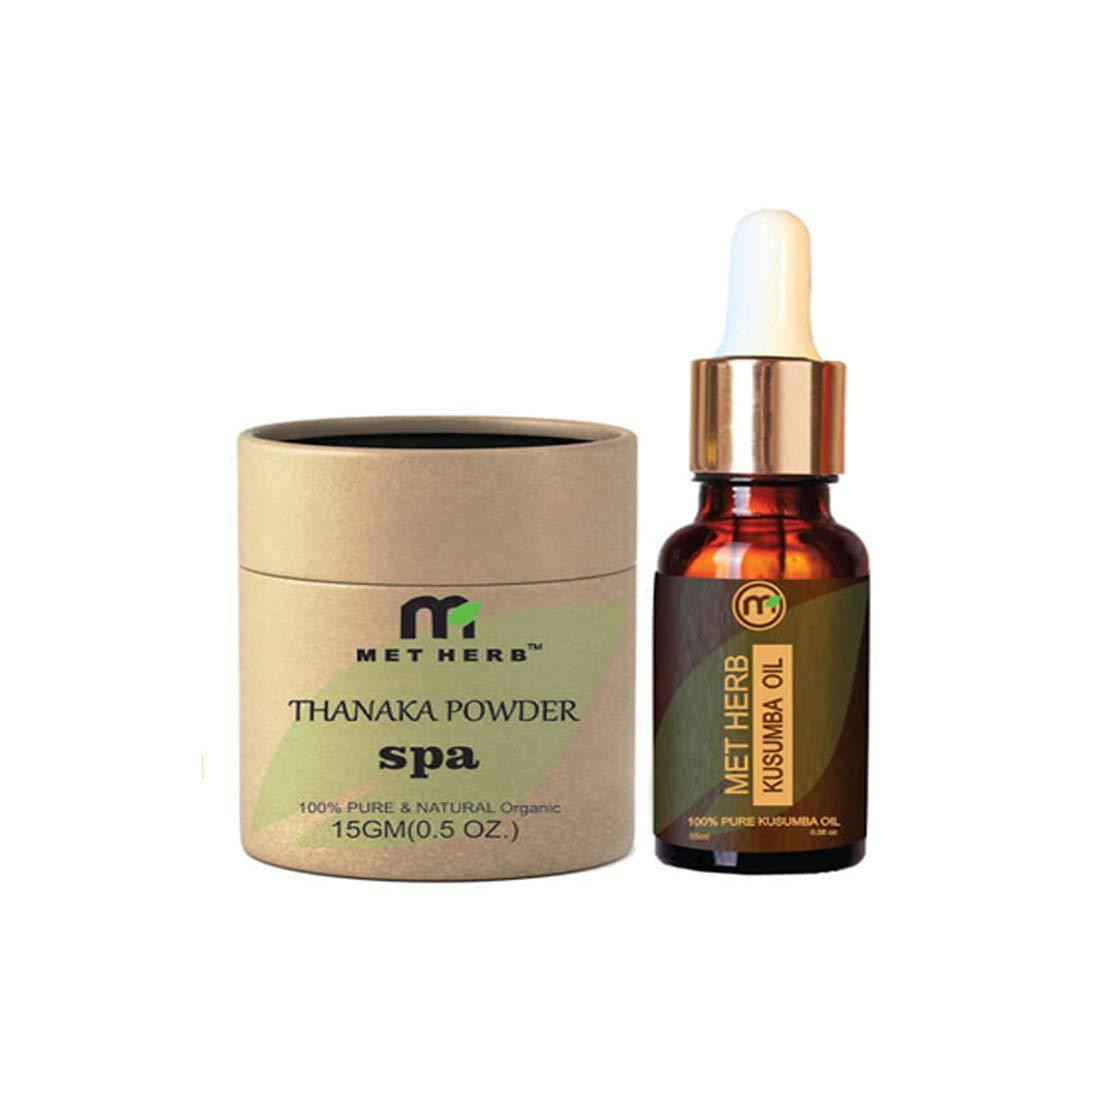 Pure & Natural Thanaka powder 15g & Kusumba oil 15ml for permanent hair removal Eco-Friendly Packing